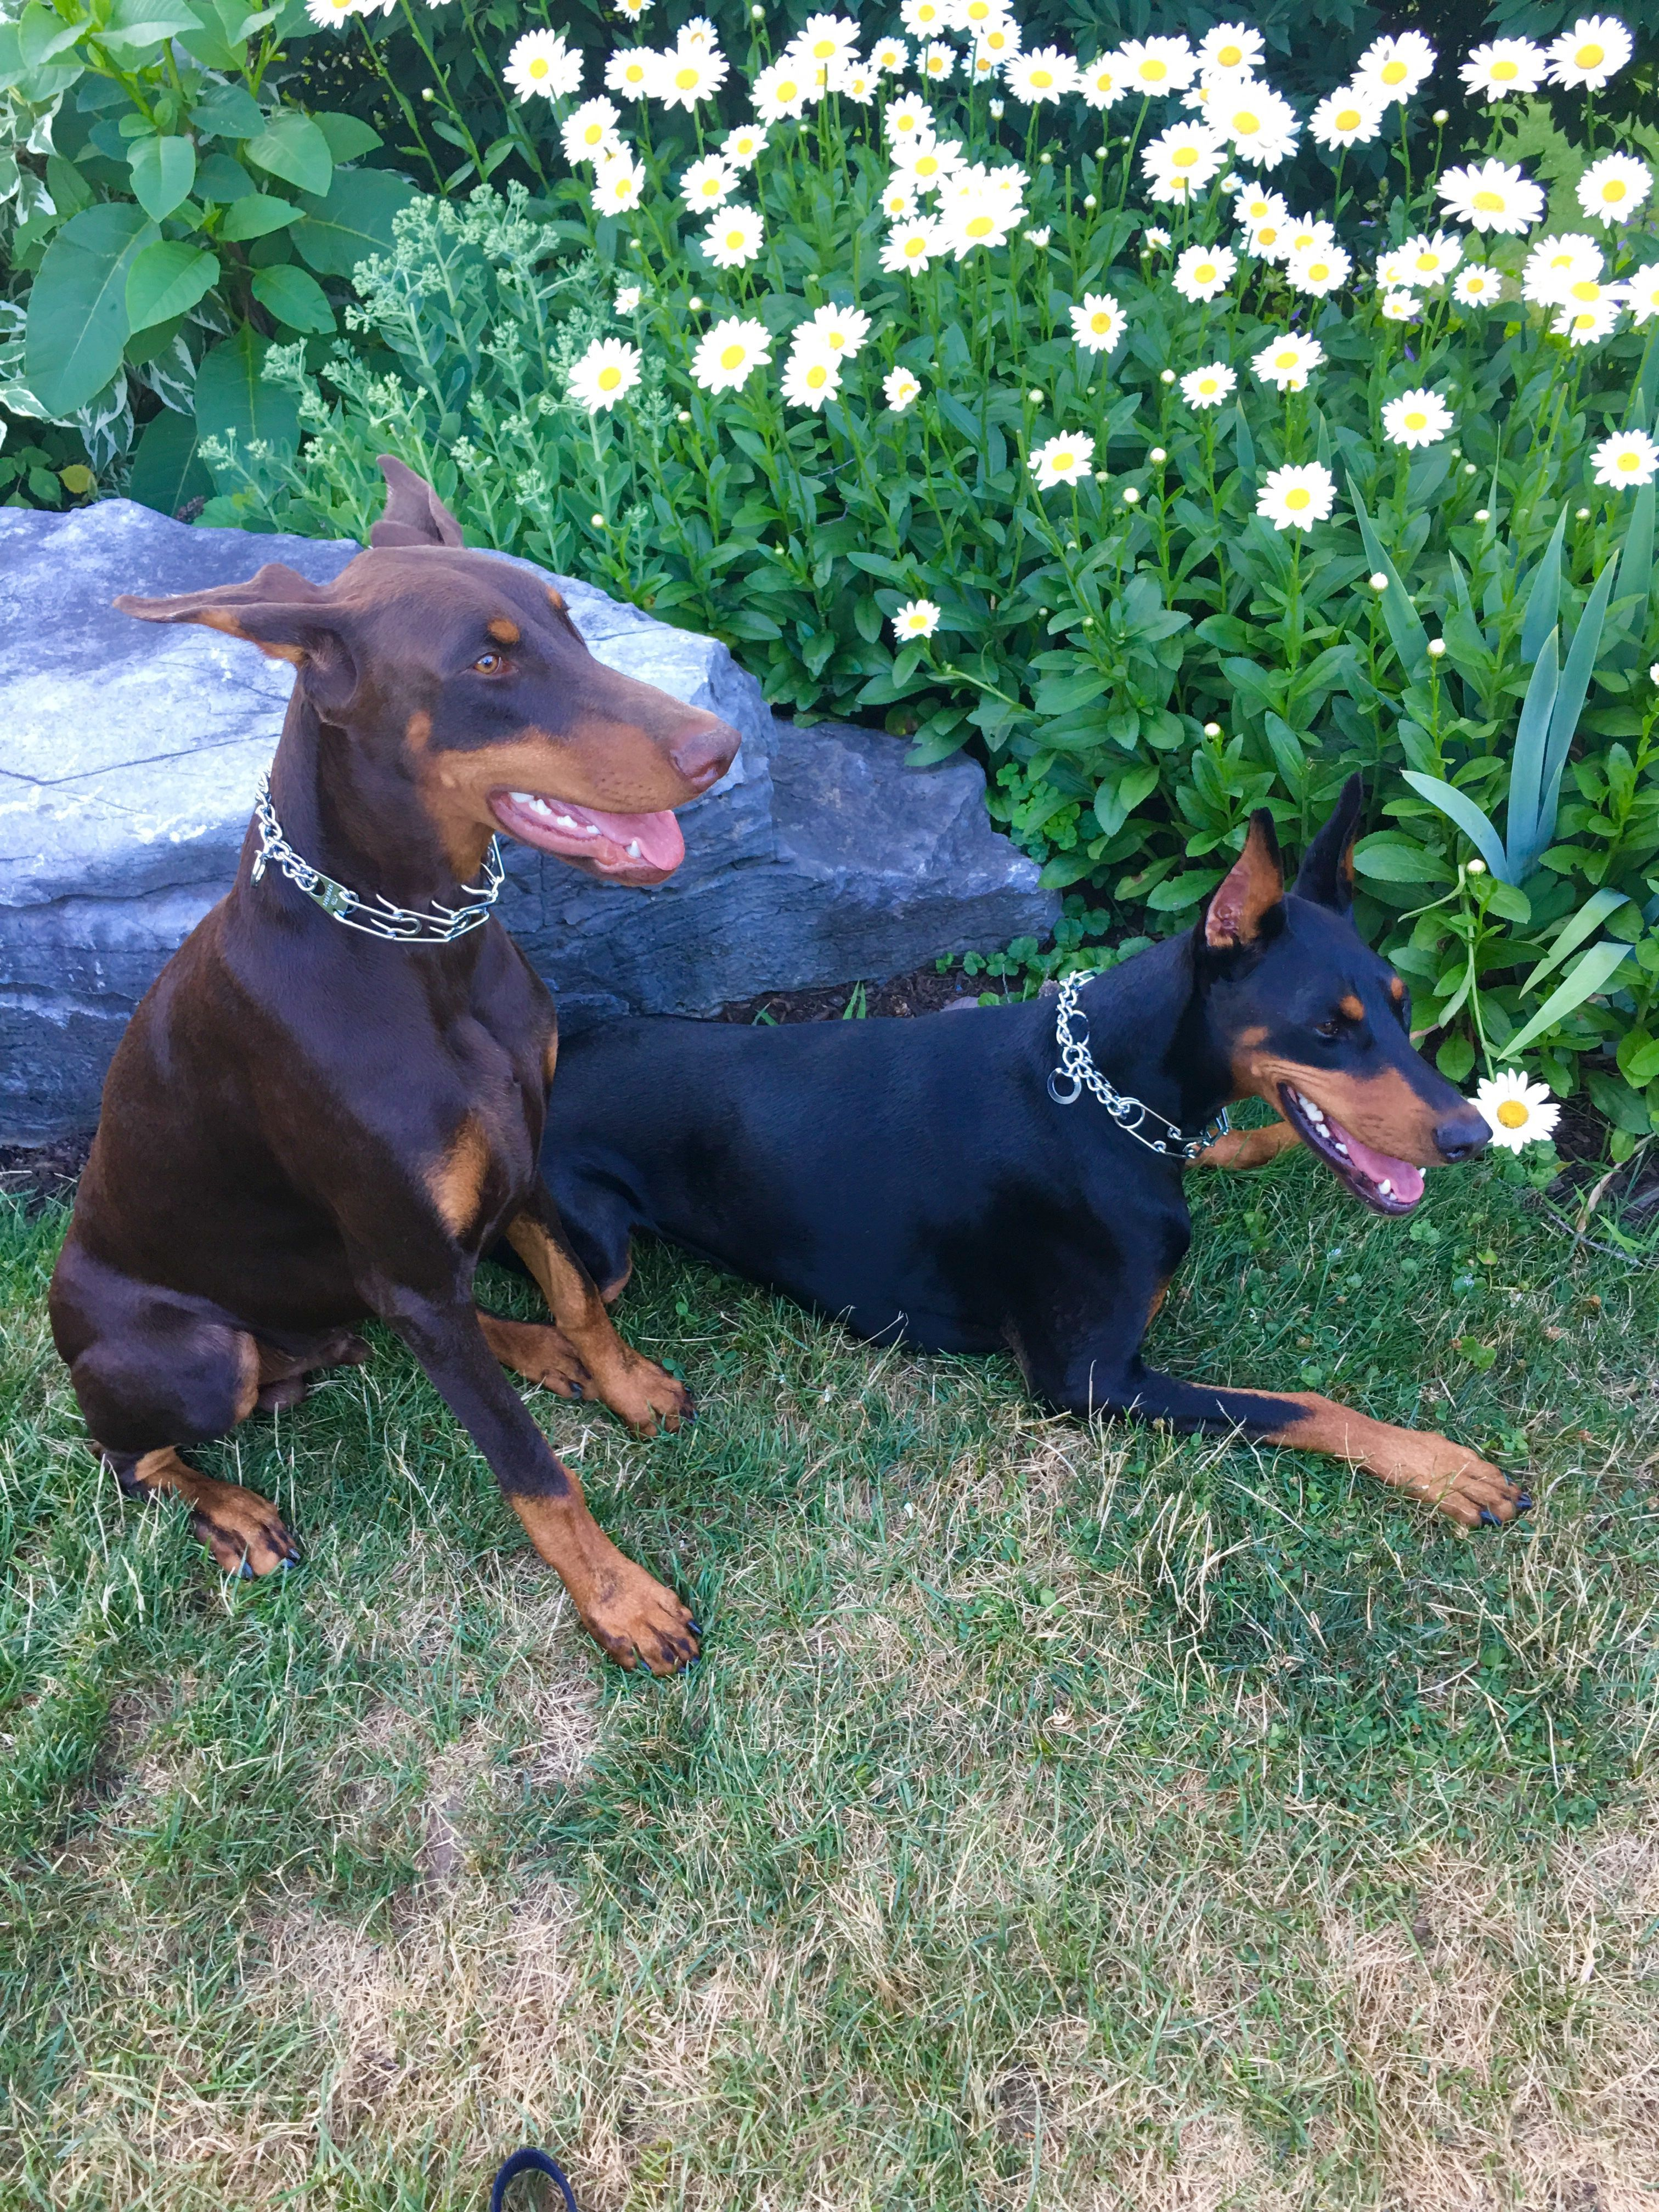 Taking A Rest At The Park Dobermanpinscher Doberman Dogs